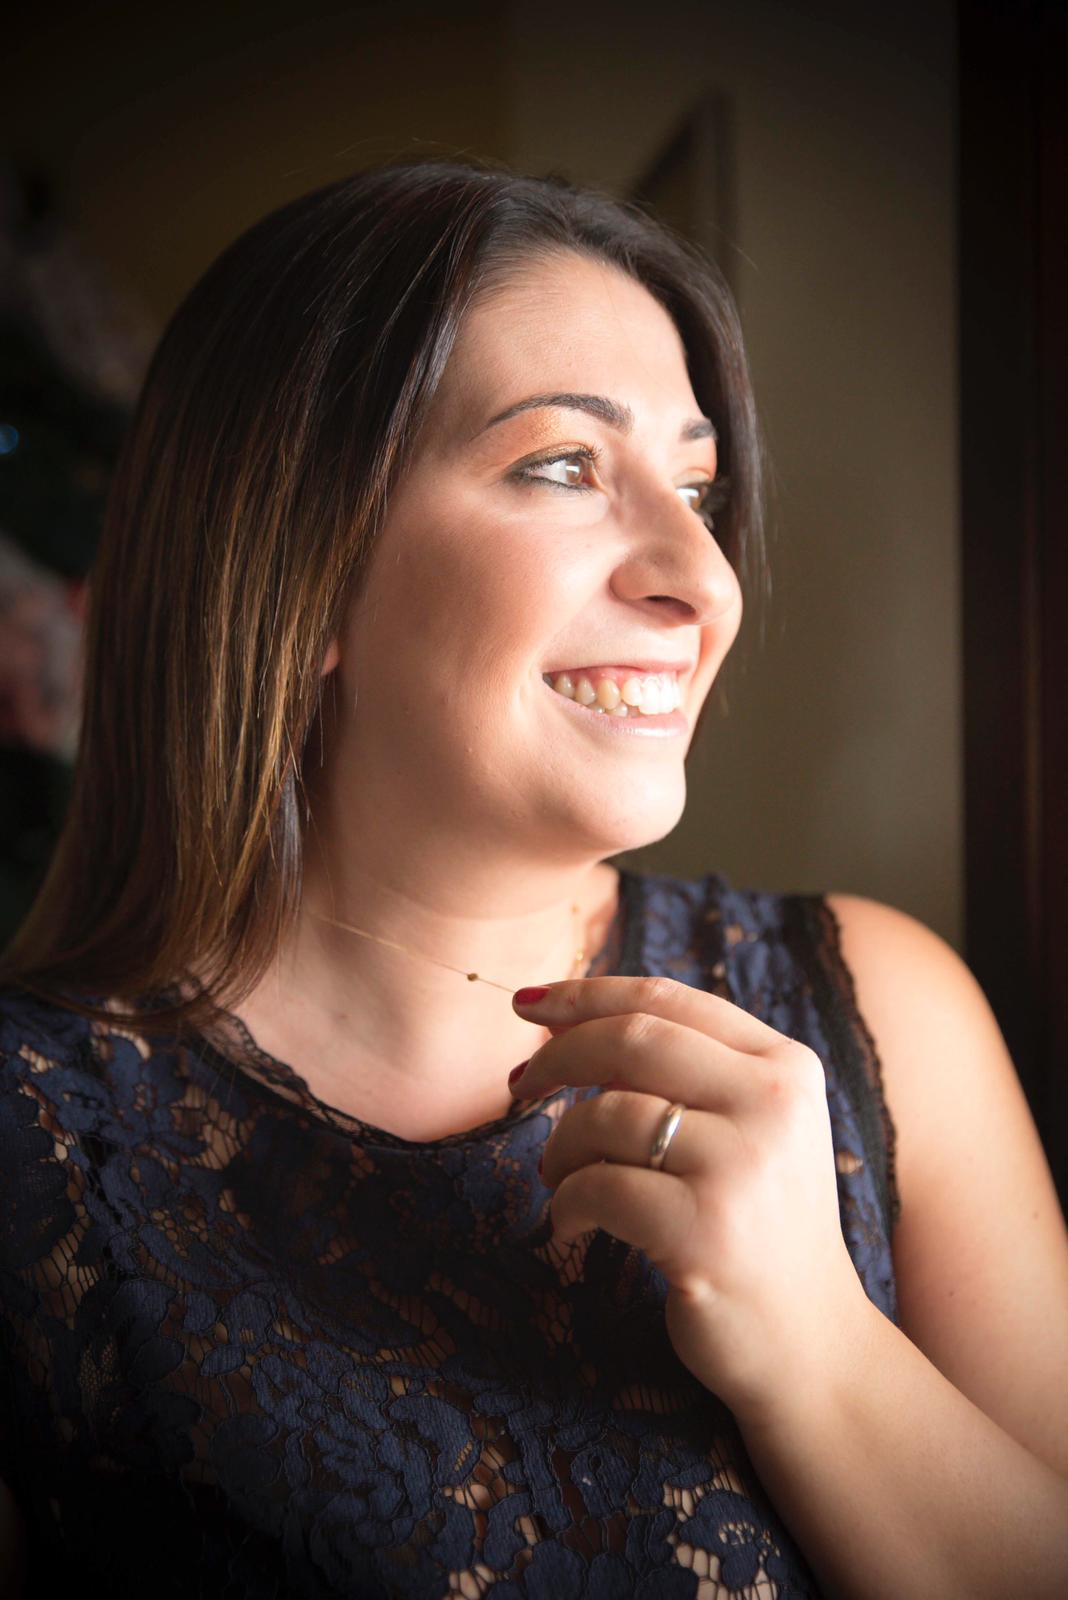 Roberta Sabatini